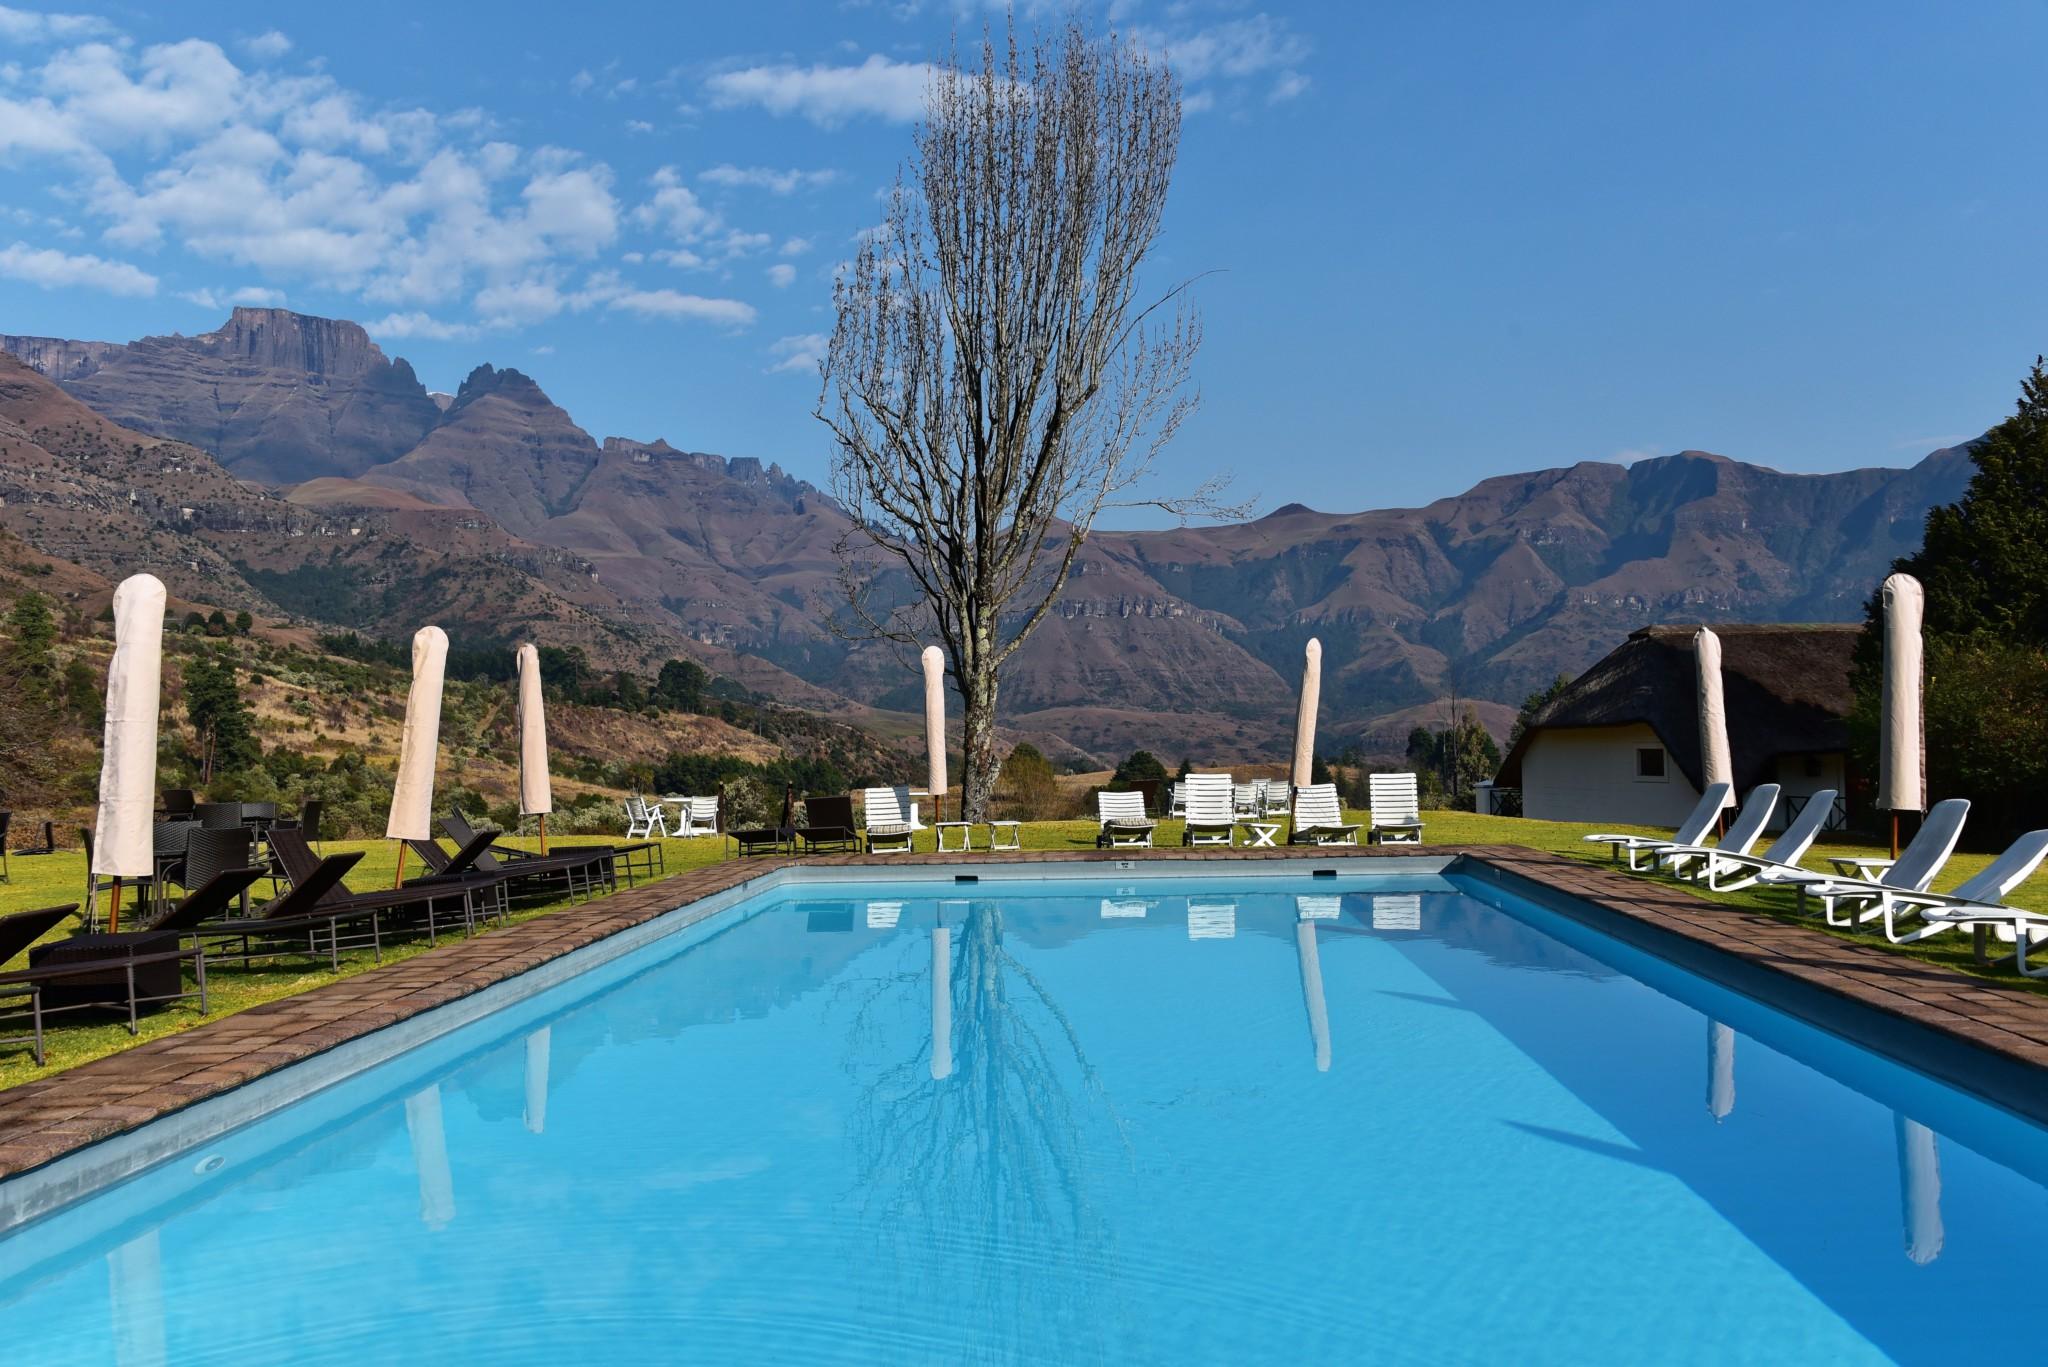 Drakensberge - Champagne Castle Hotel